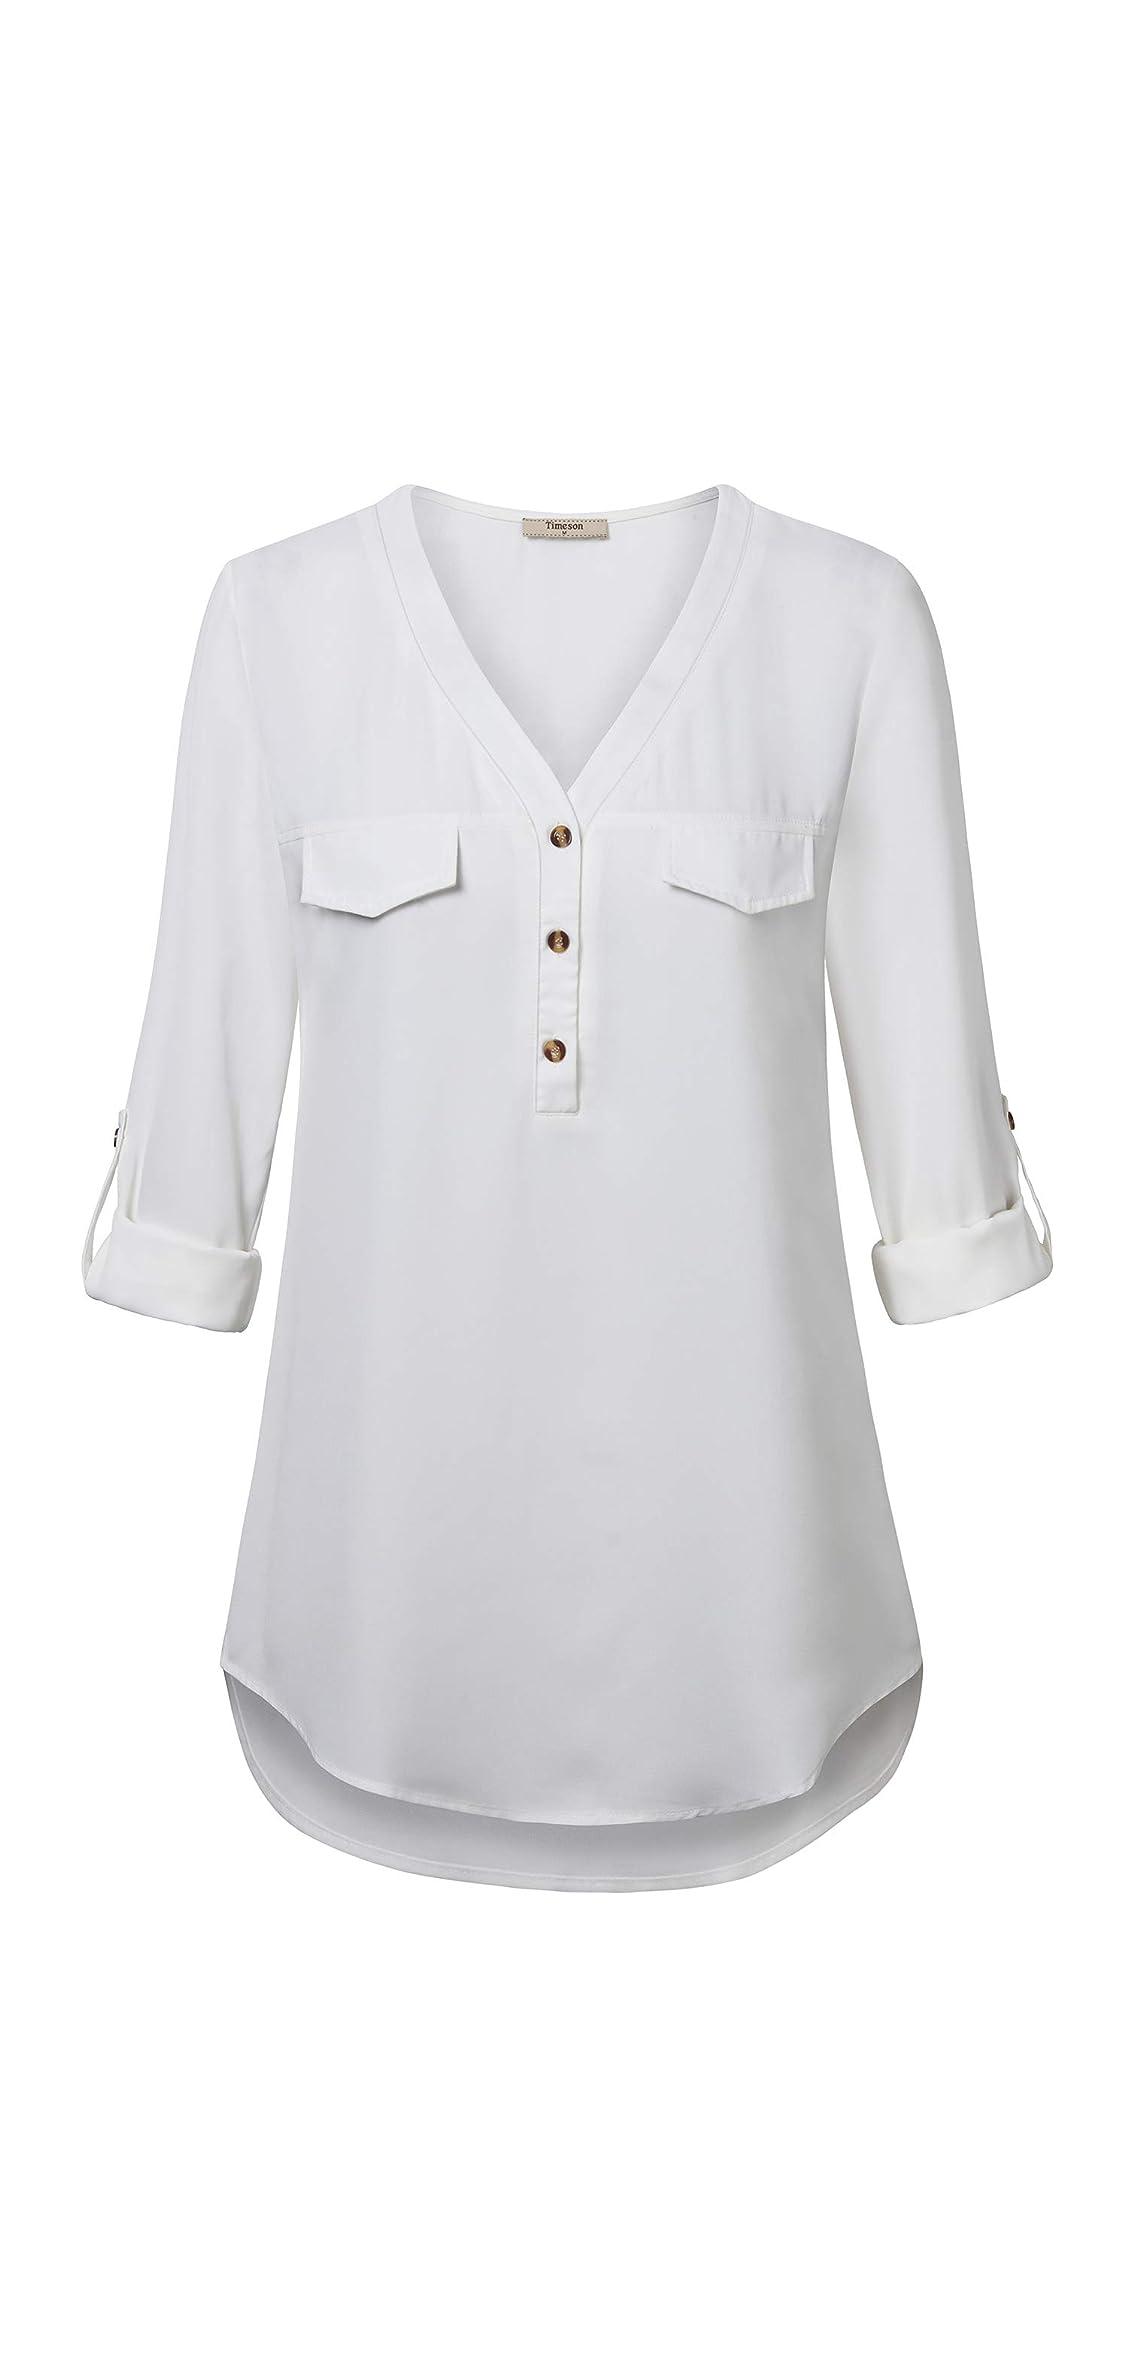 Women's V Neck Chiffon Blouses / Sleeve Button Down